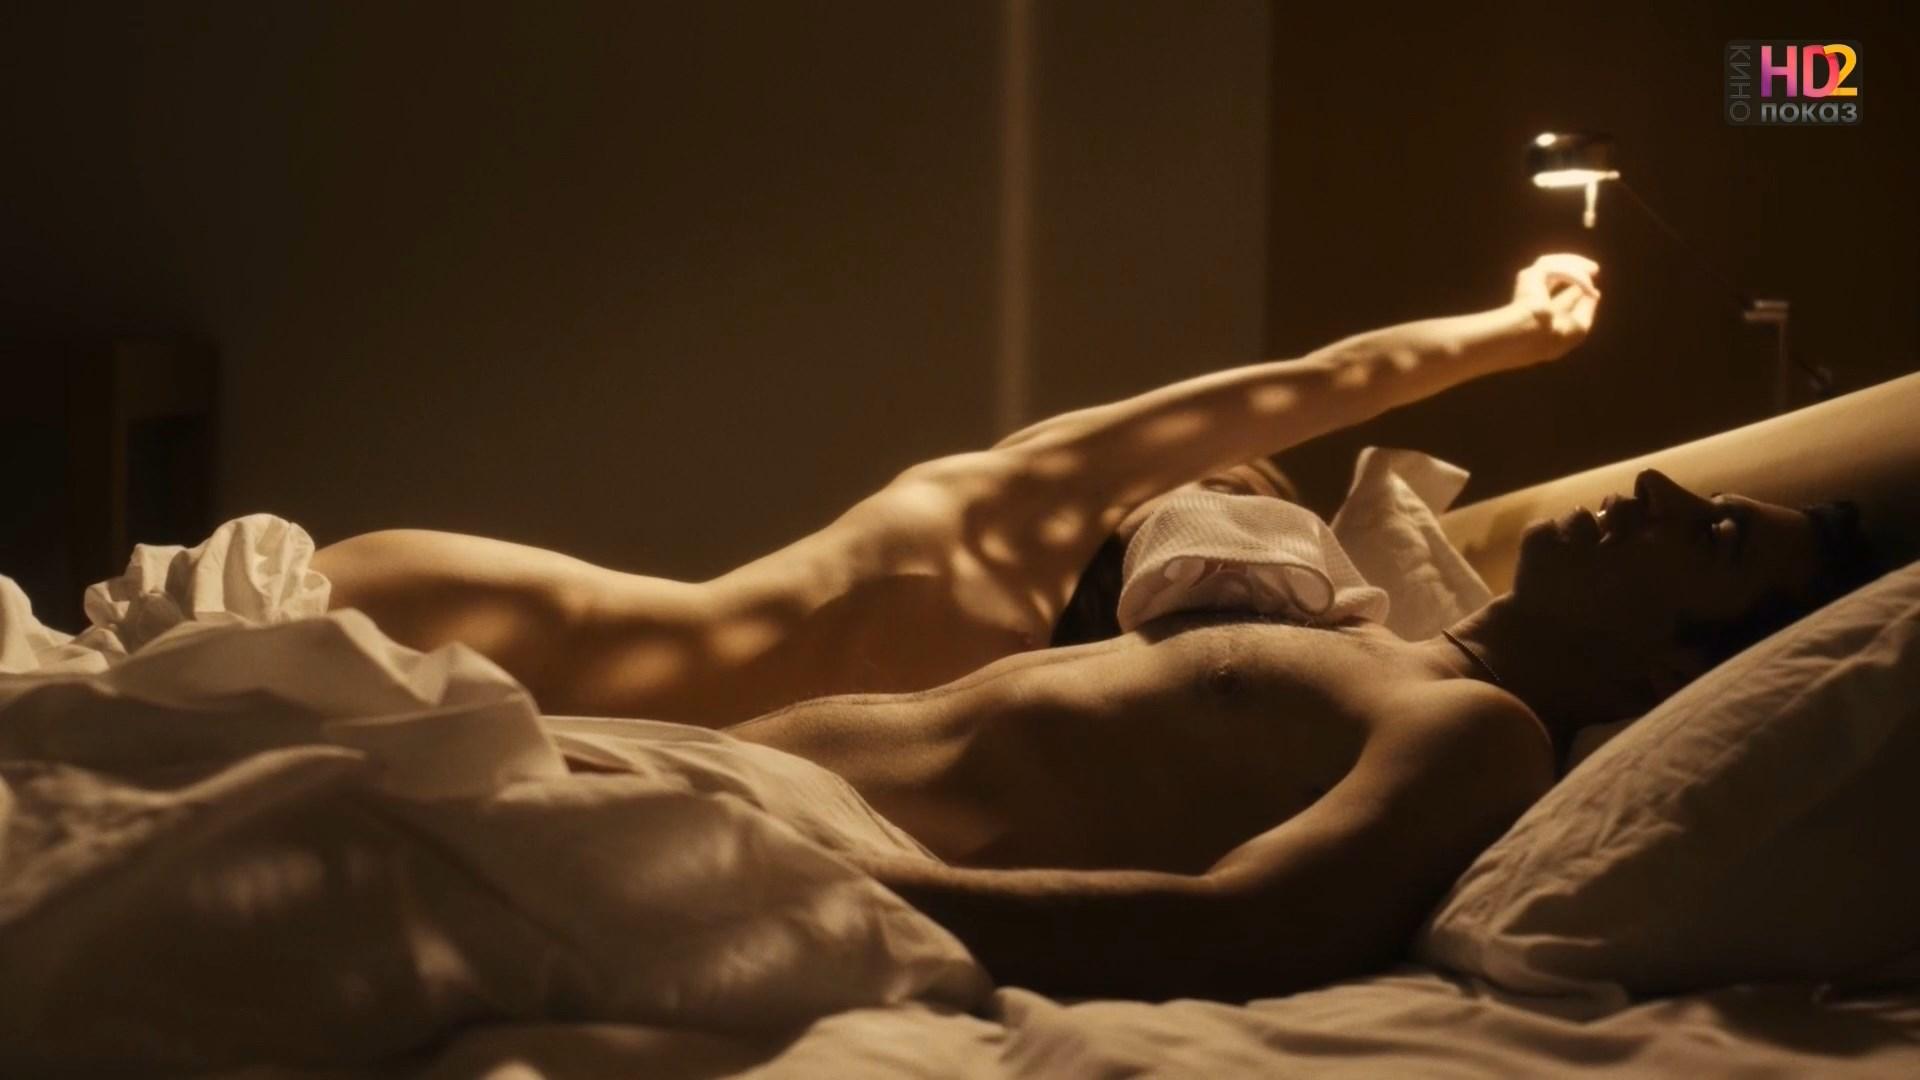 Heather mills nude model